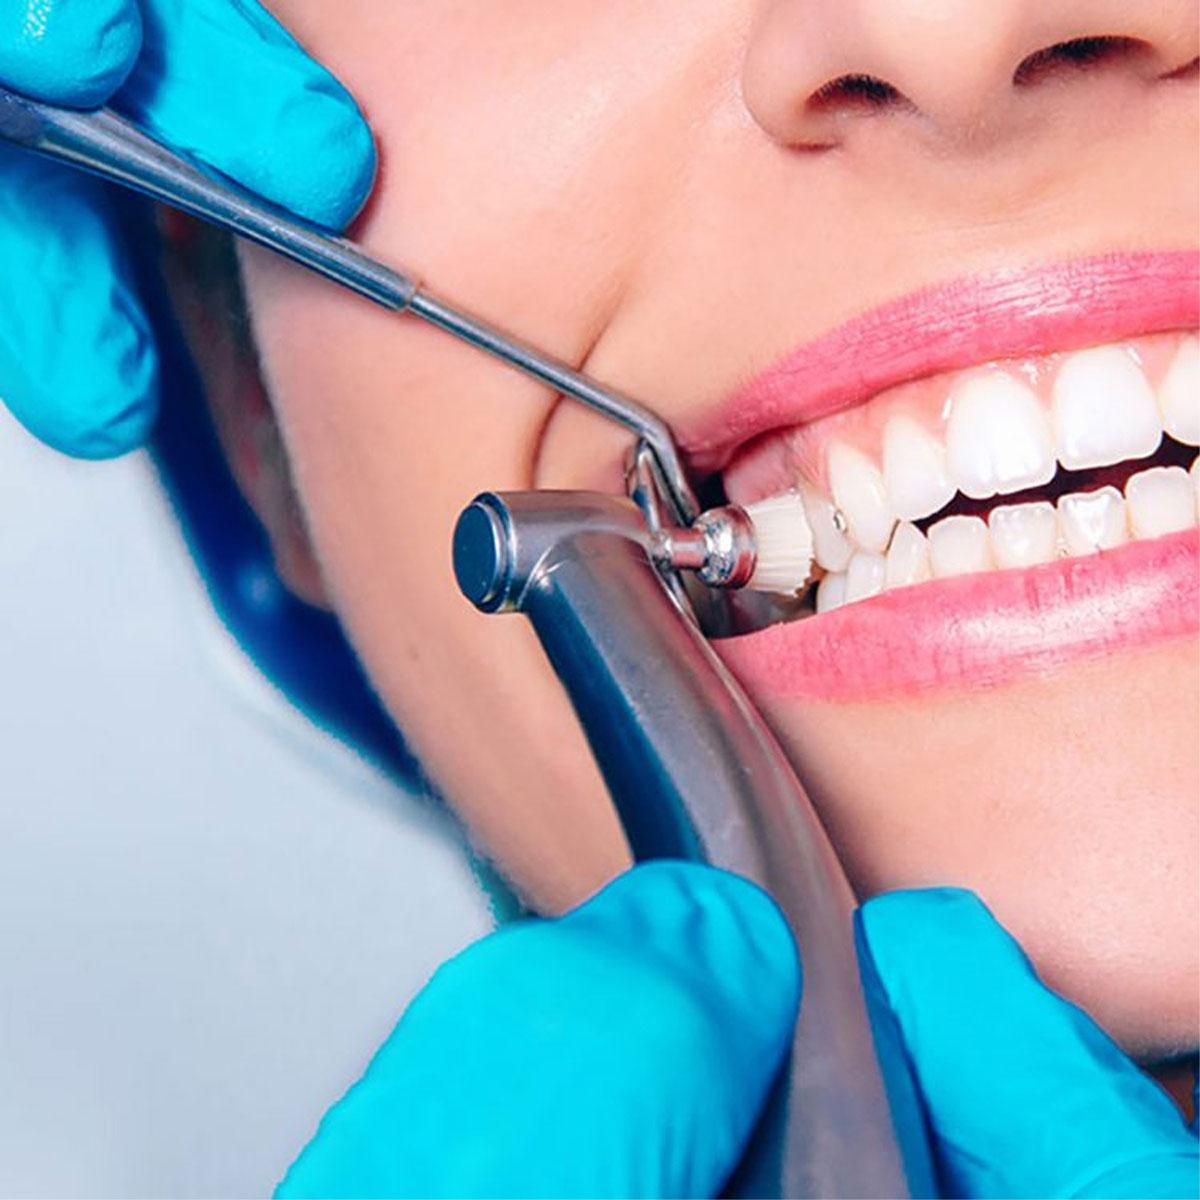 Dental-Cleaning-1200xx-1.jpg?fit=1200%2C1200&ssl=1